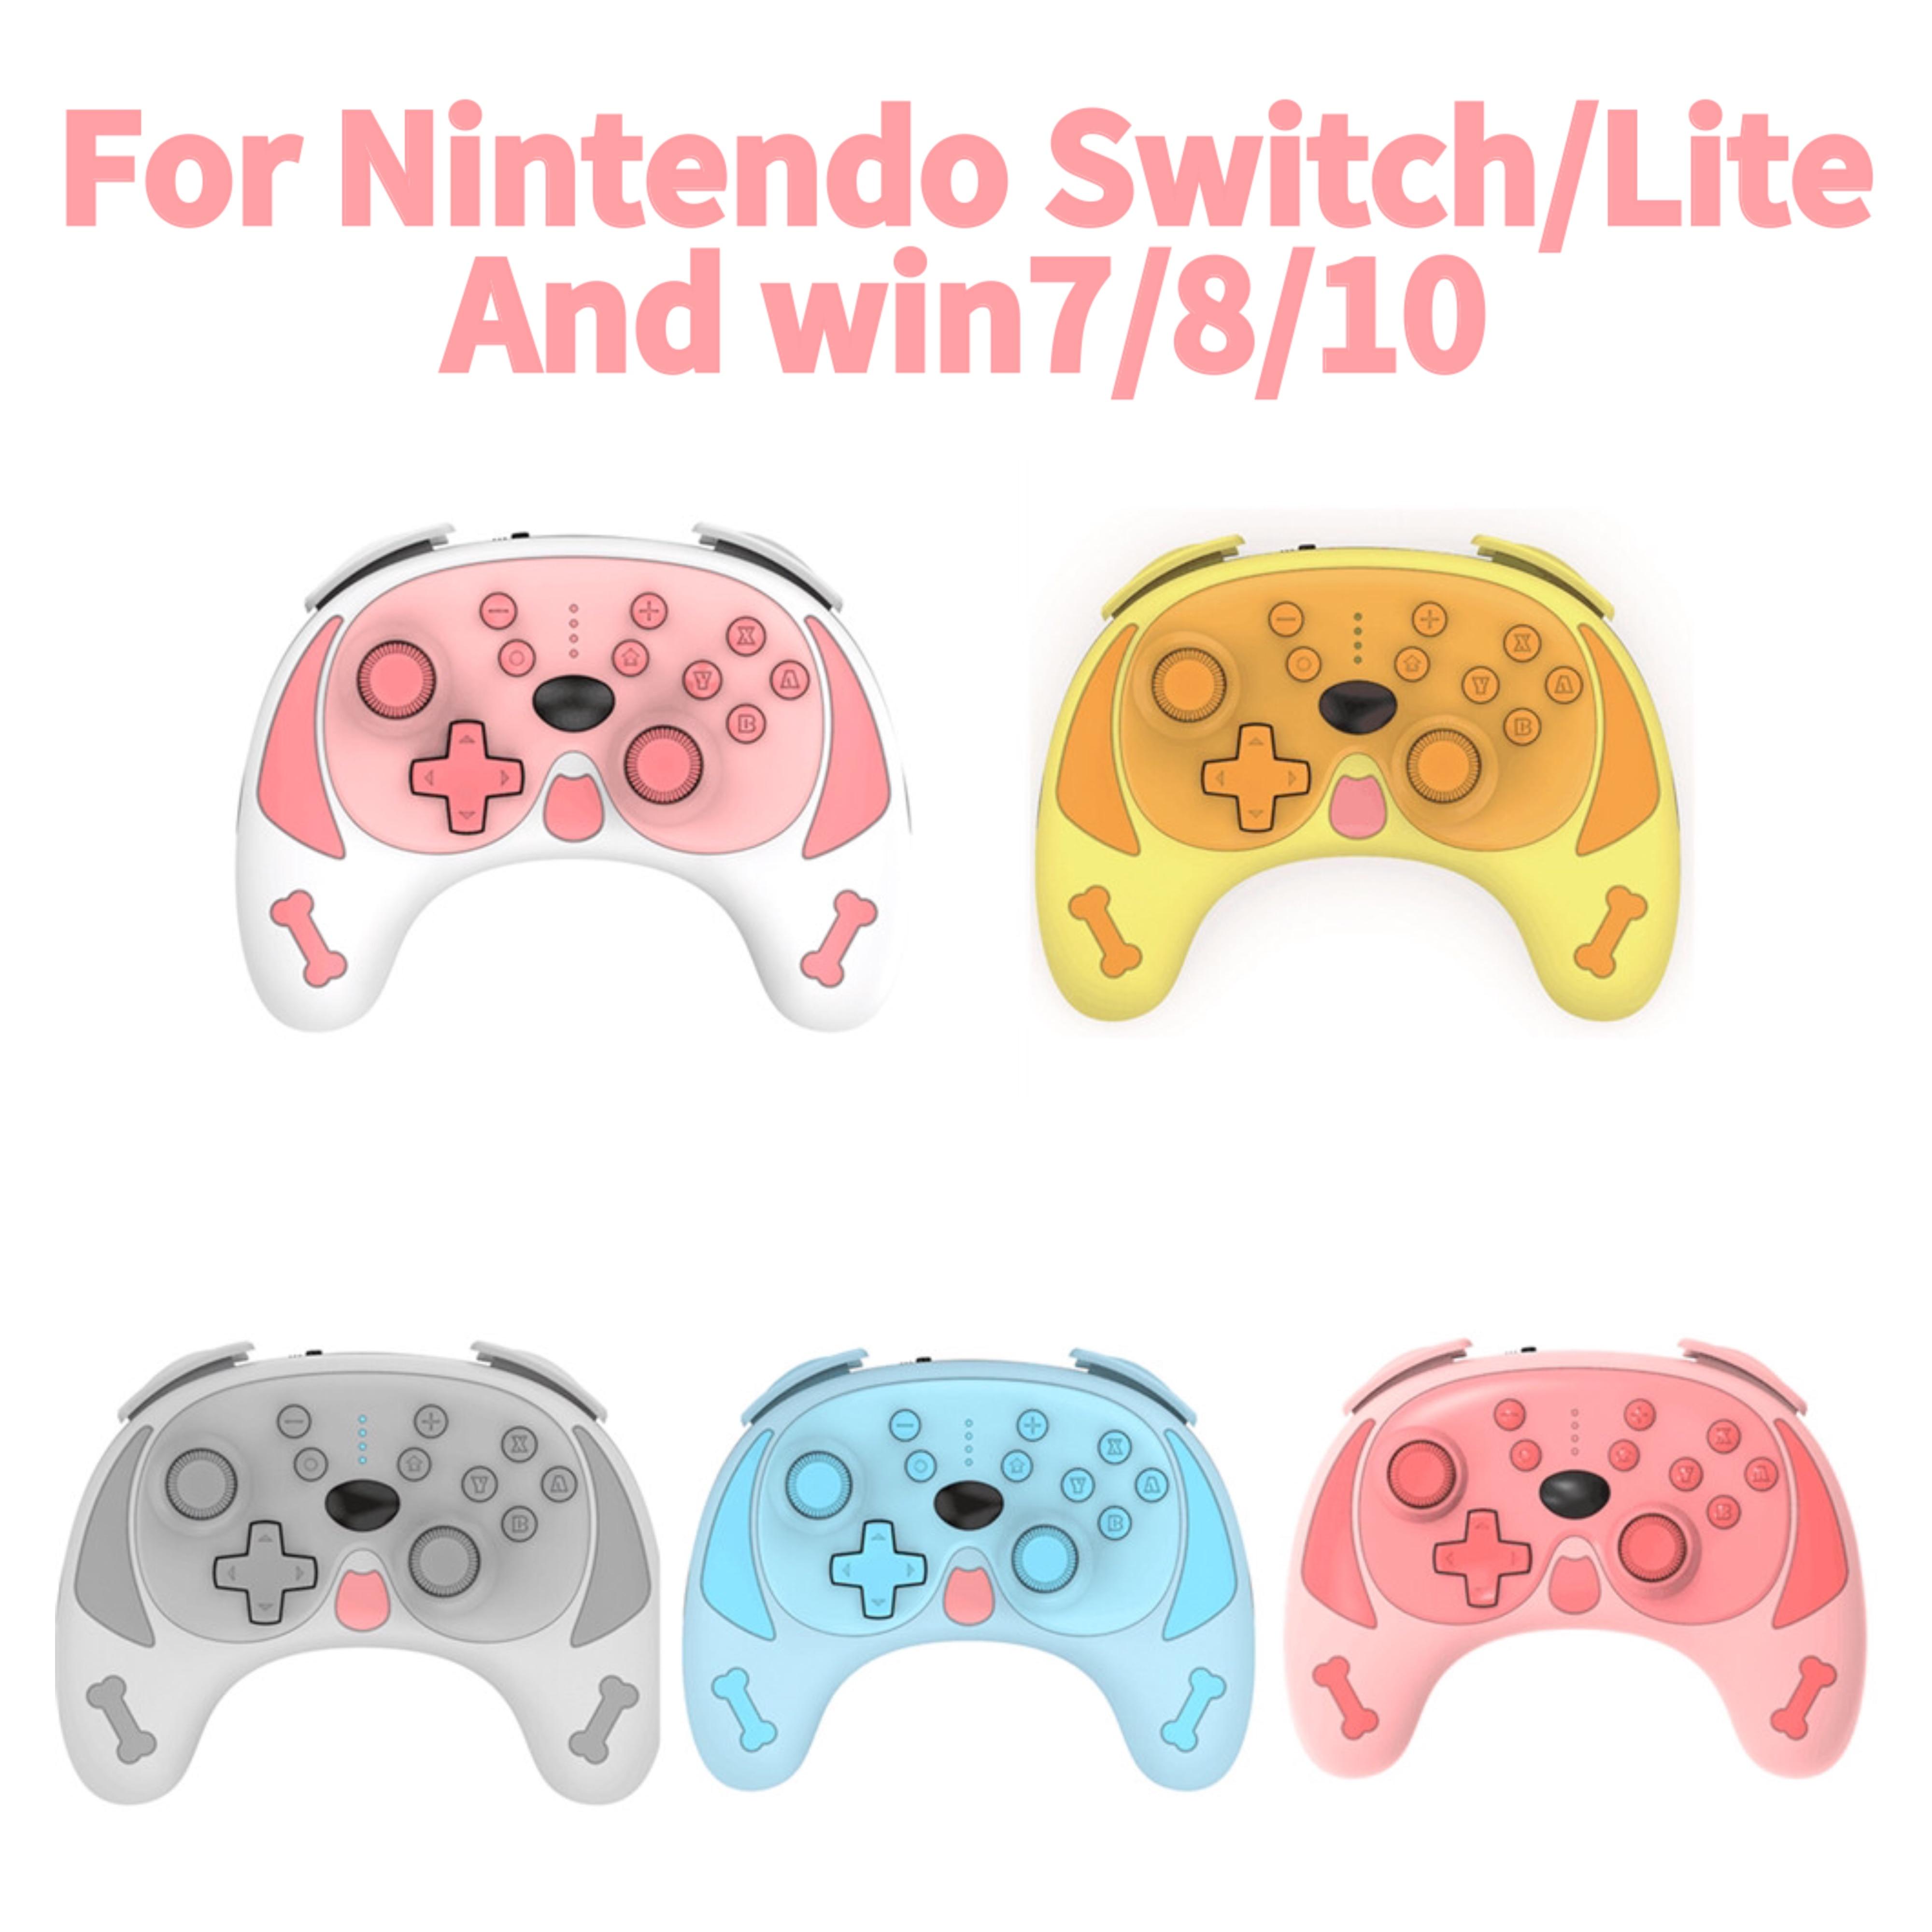 Bluetooth Wireless Controller Gamepad Joystick For Nintendo Switch /Switch Lite And PC Window7/8/10